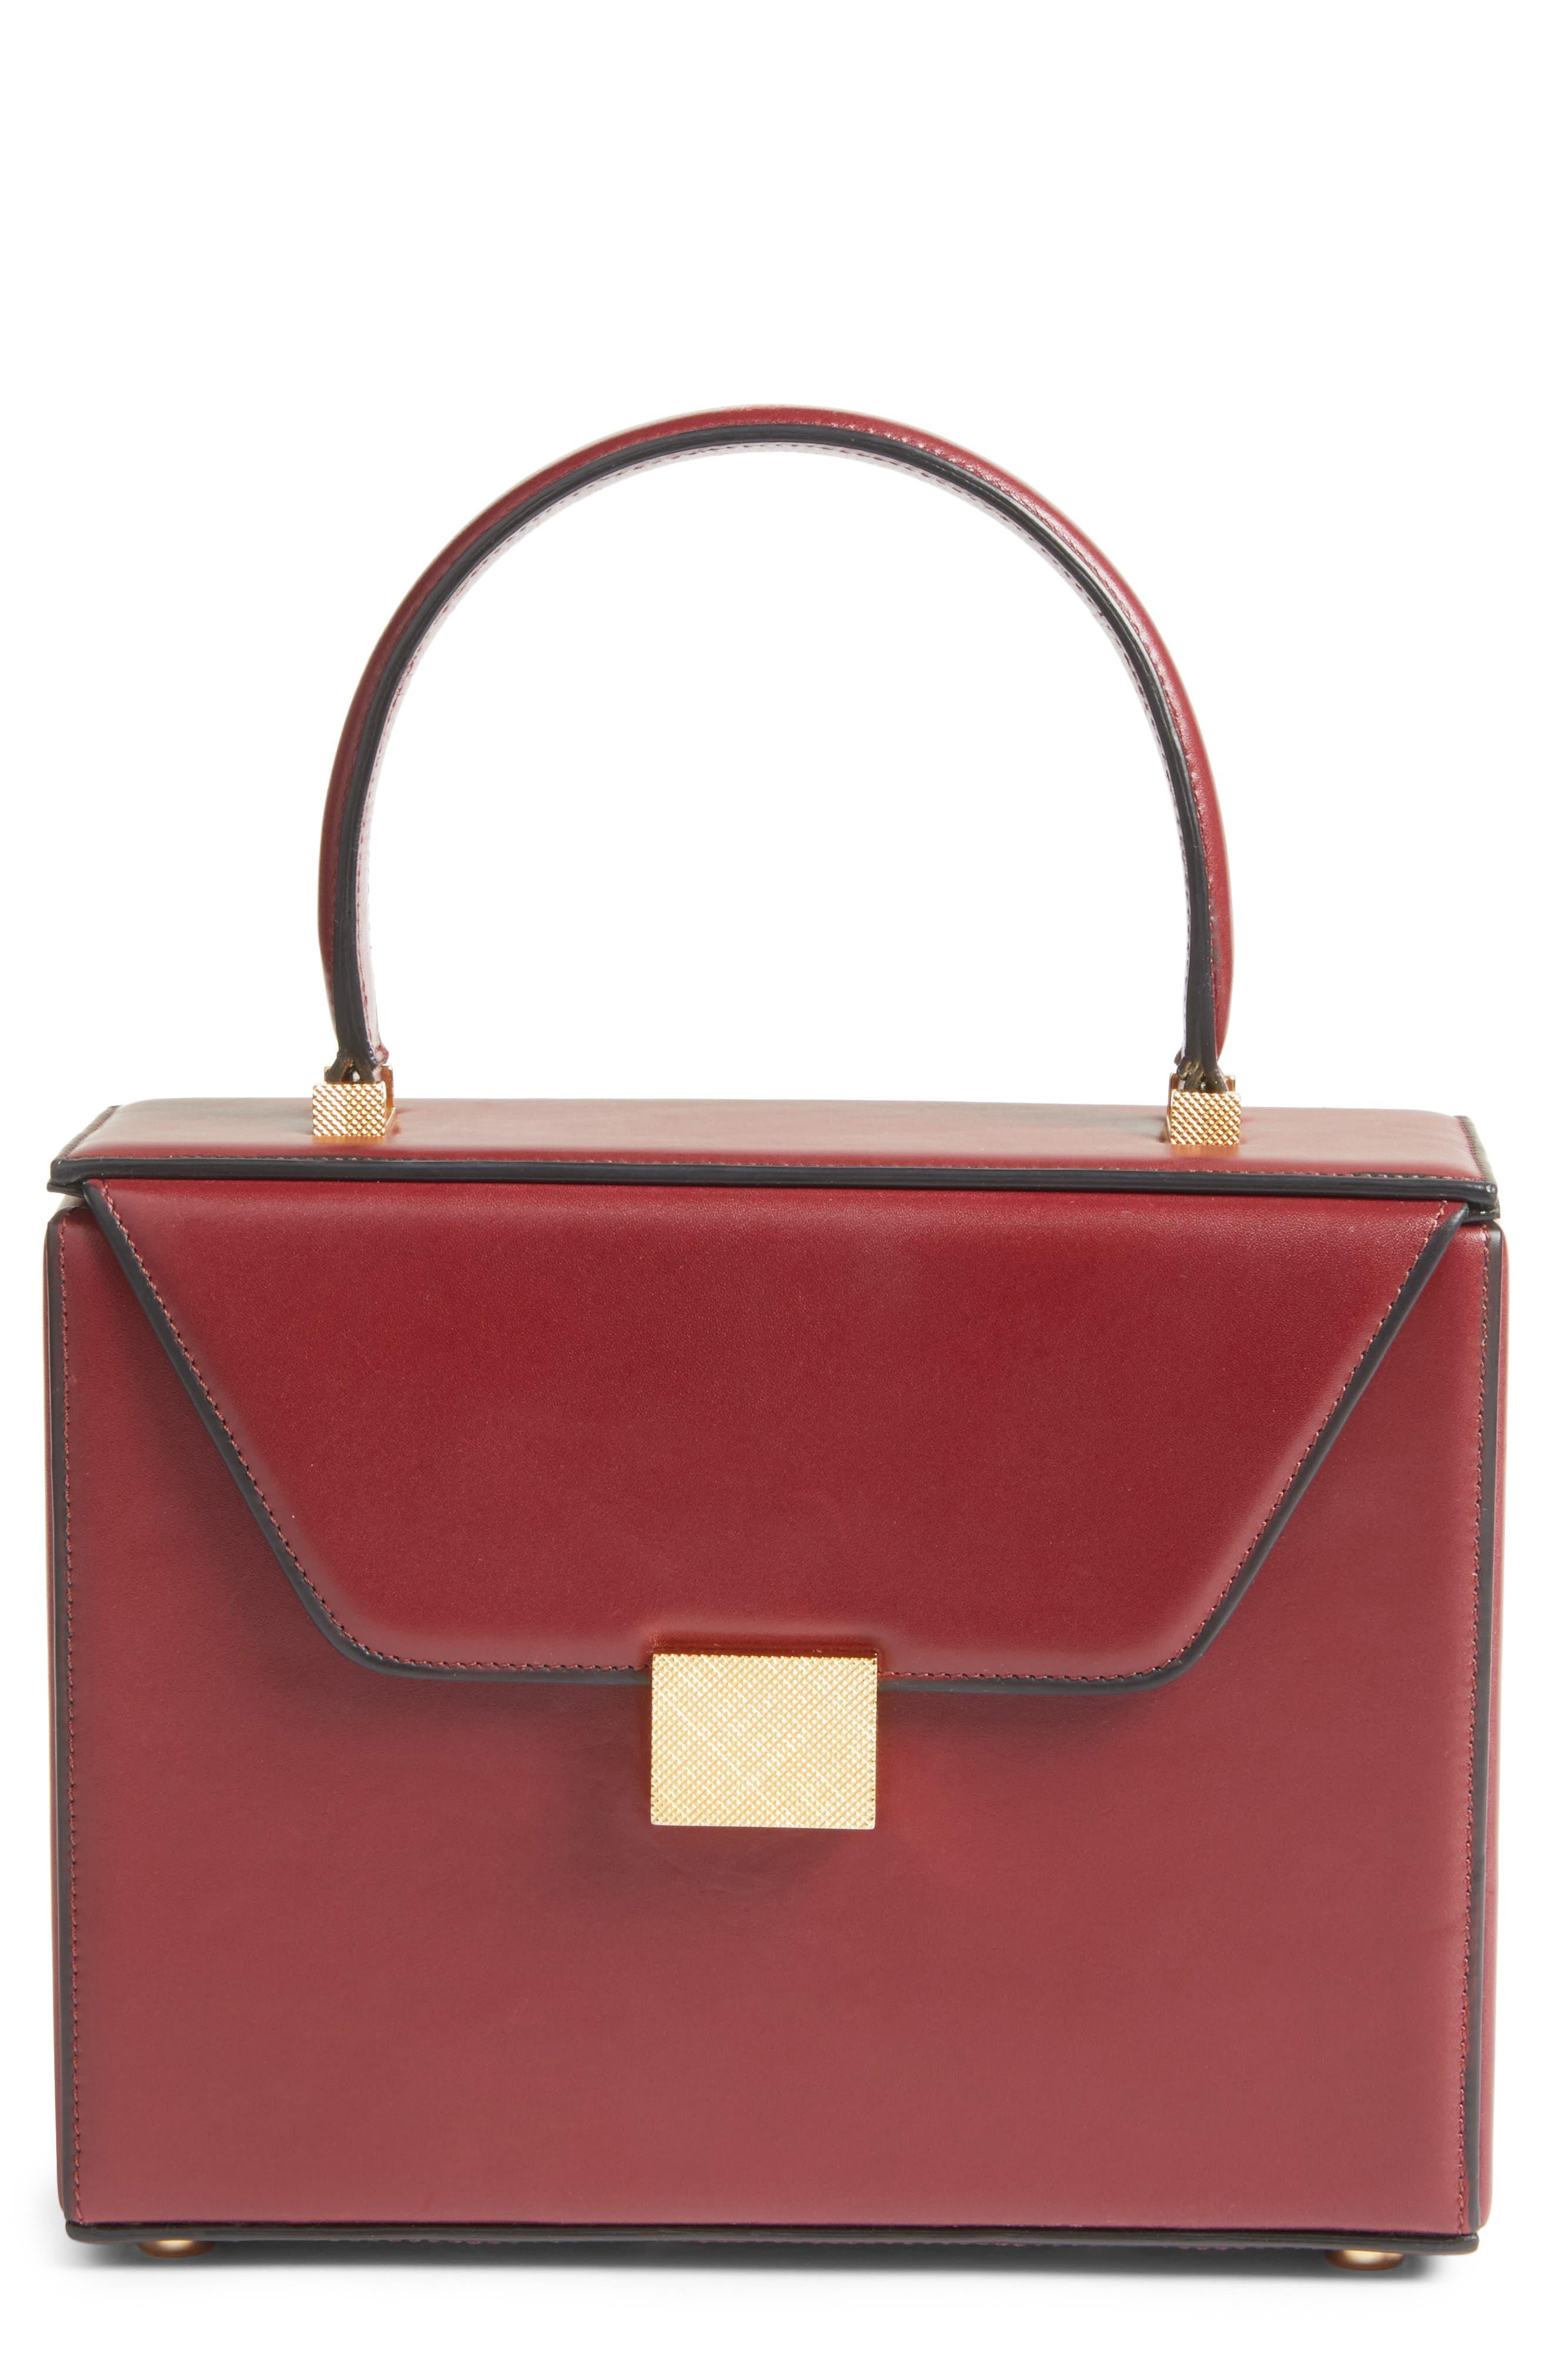 Main Image - Victoria Beckham Mini Vanity Top Handle Box Bag